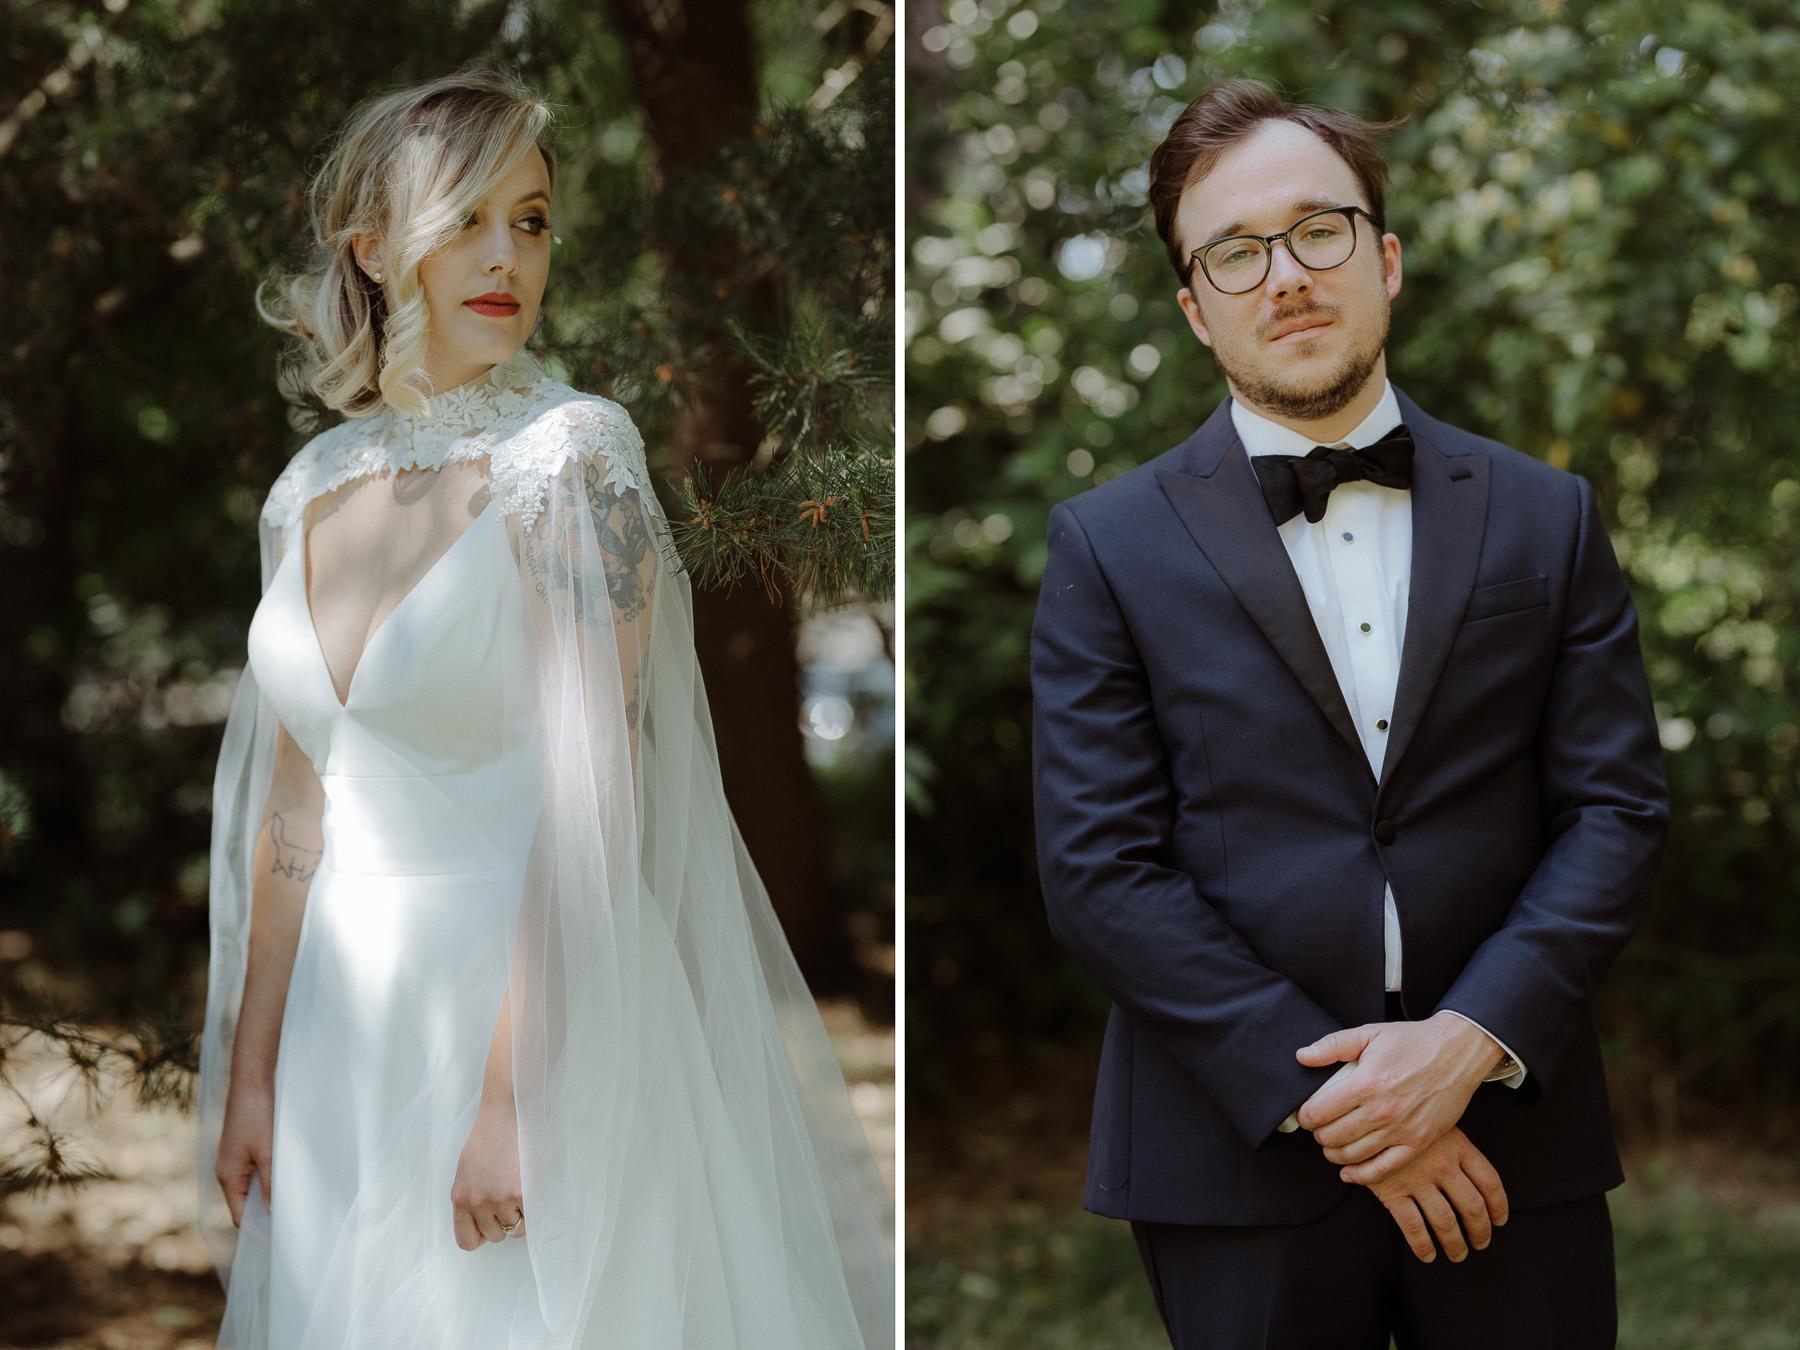 enowen-wedding-photography-mike-anna-suffolk-punch-charlotte (19 of 78).jpg